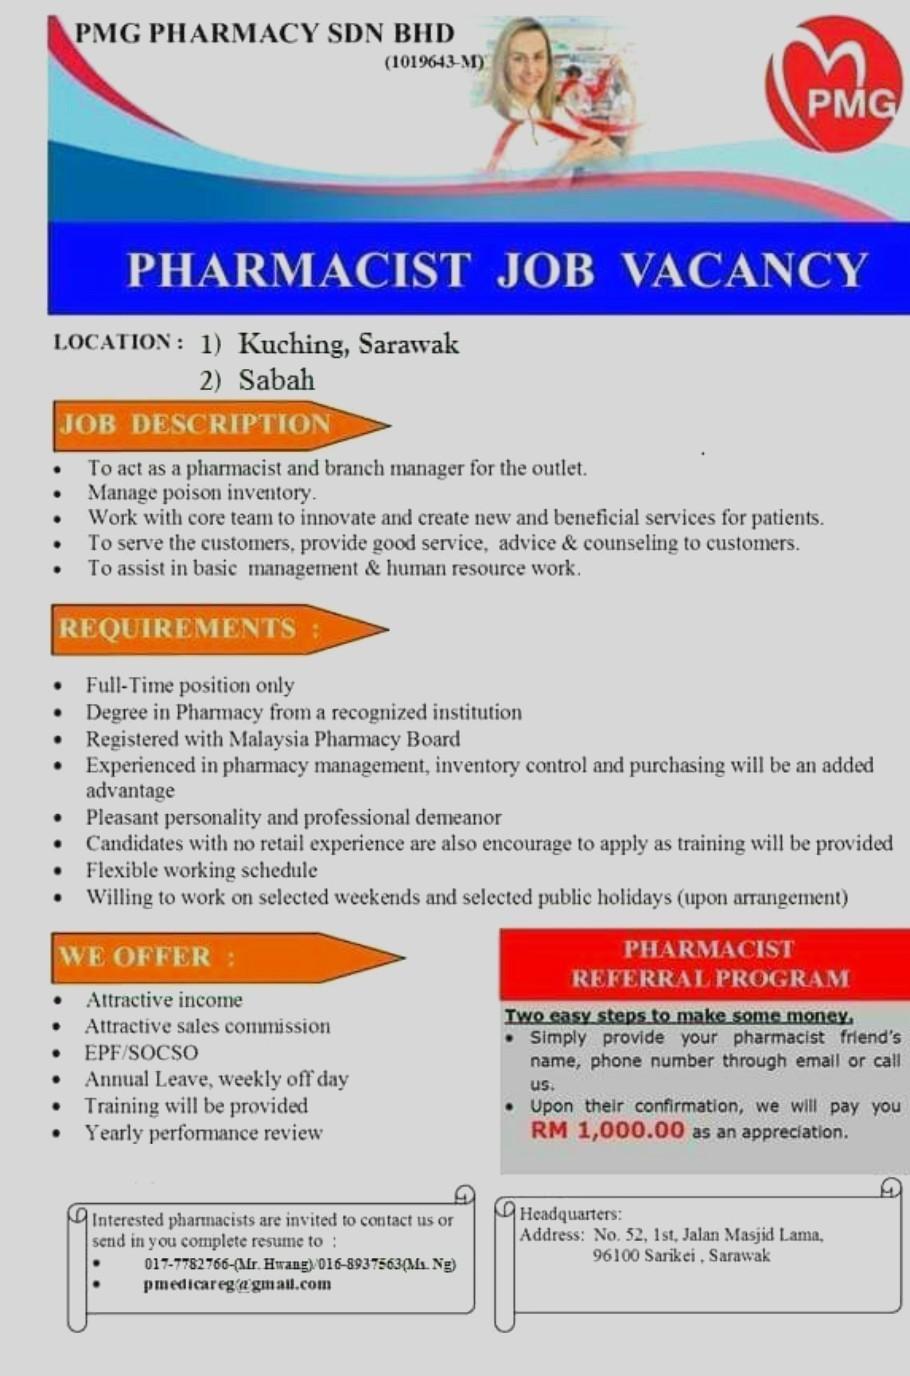 Kak Tolang Bantuannya Tolong Banget Bikinkan Surat Lamaran Kerja Pharmacy Dari Iklan Tersebut Ke Brainly Co Id